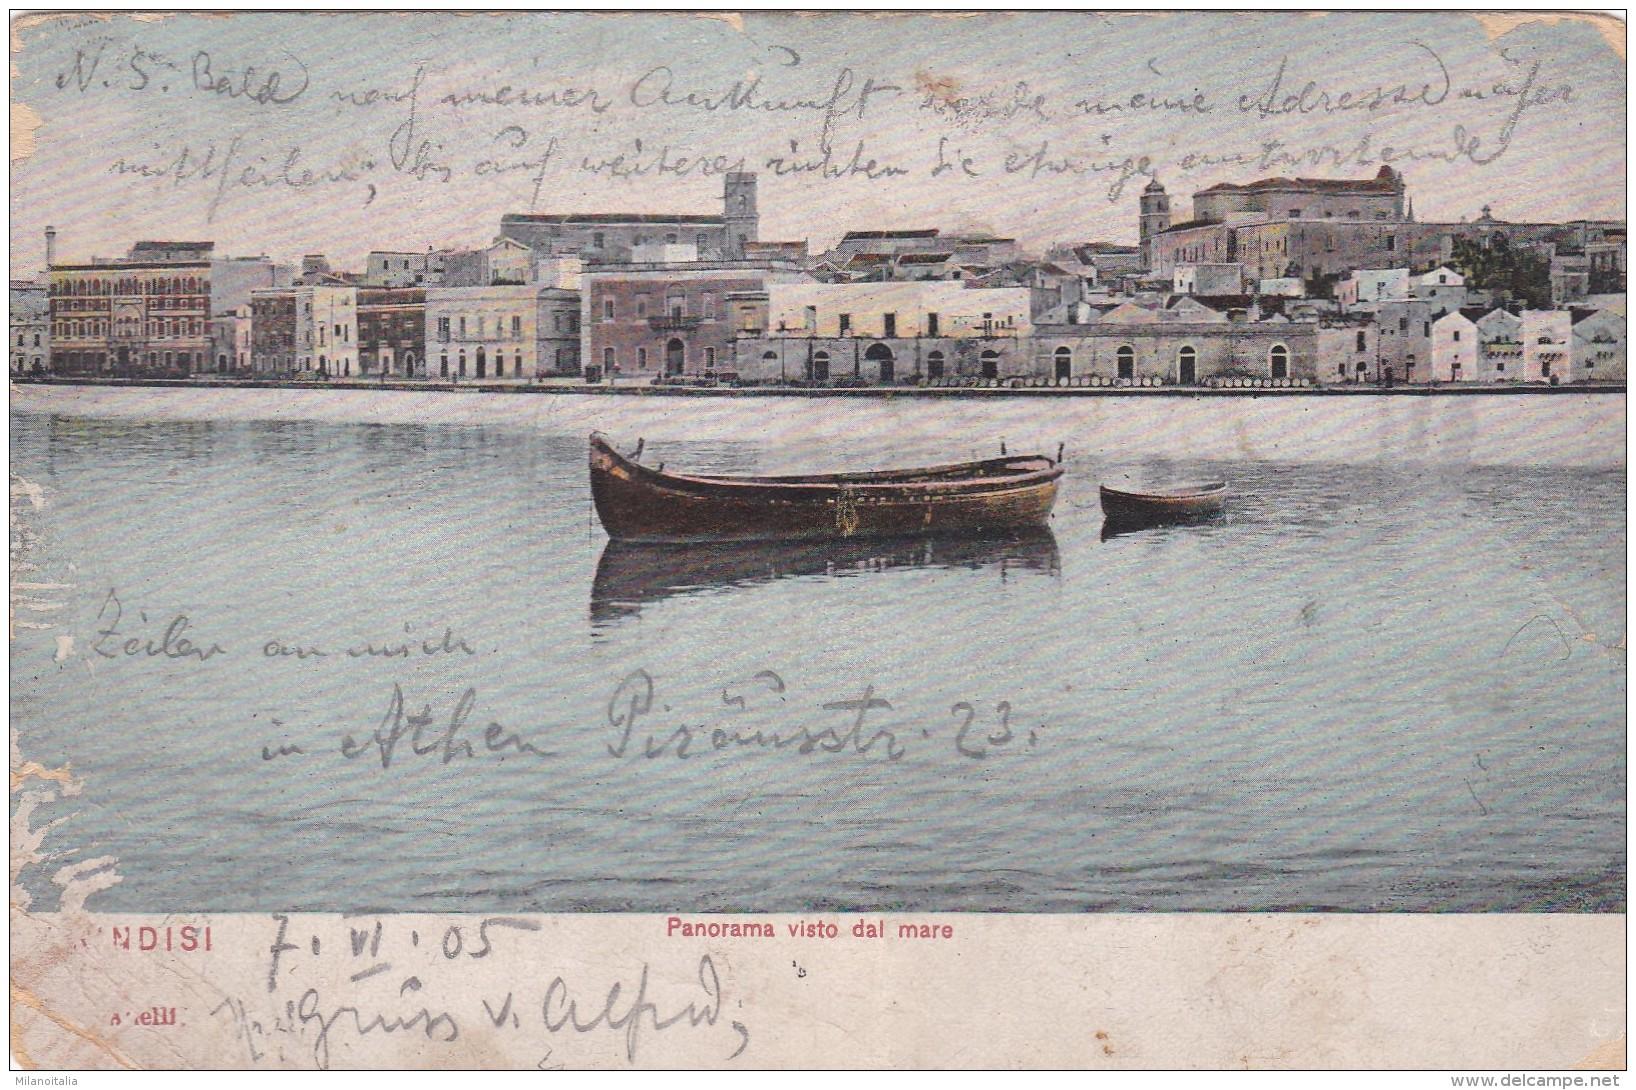 Brindisi - Panorama Visto Dal Mare * 7. VI. 1905 - Brindisi